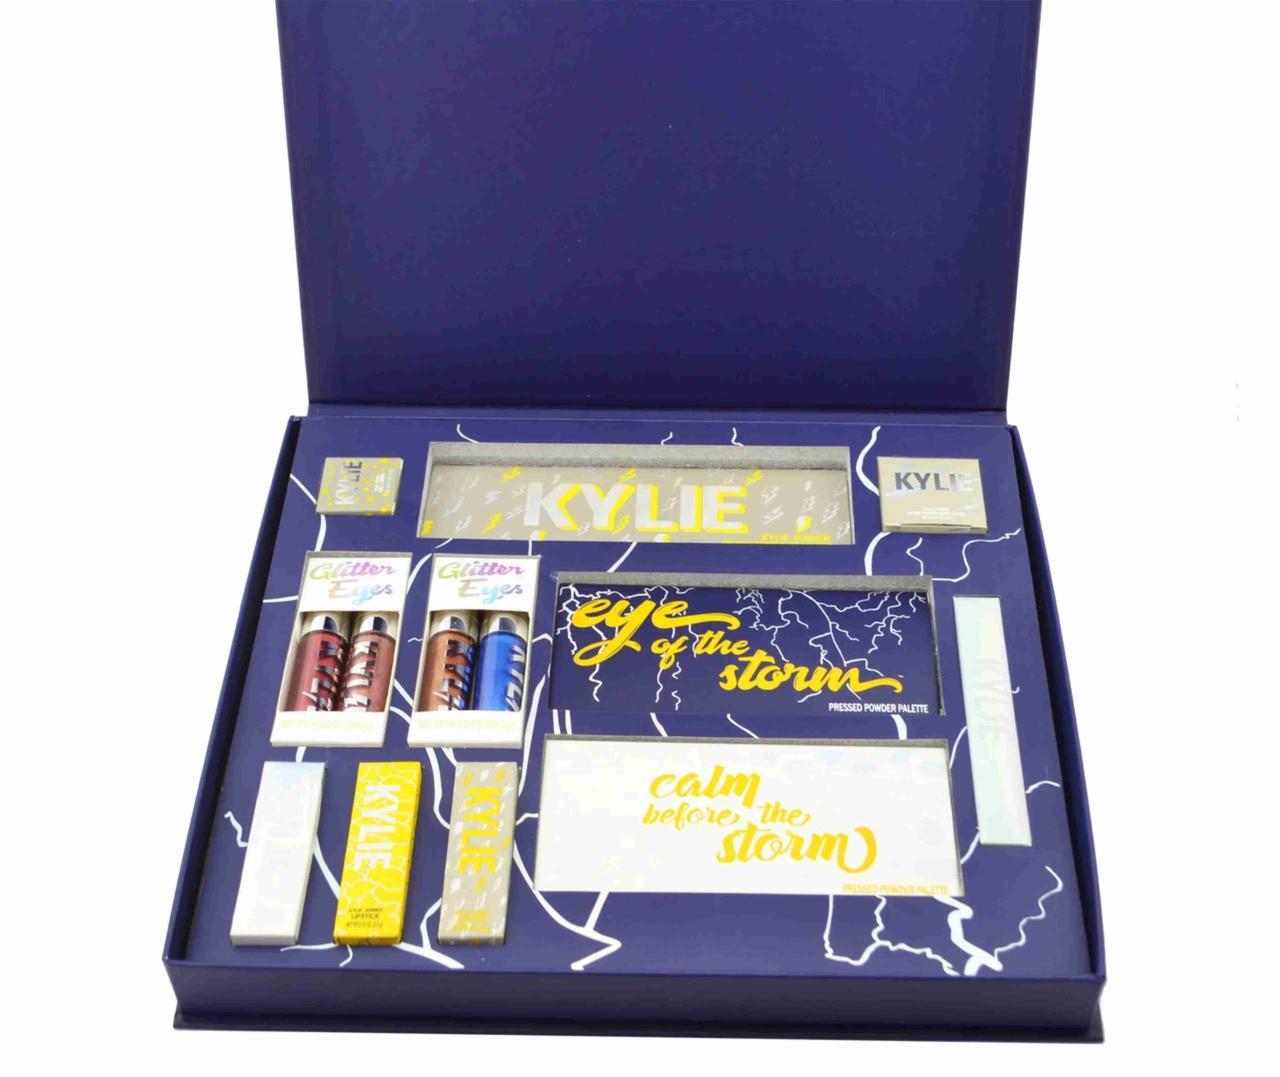 Подарочный набор косметики Kylie Weather Collection синий Подарочный косметический набор KYLIE JENNER синий